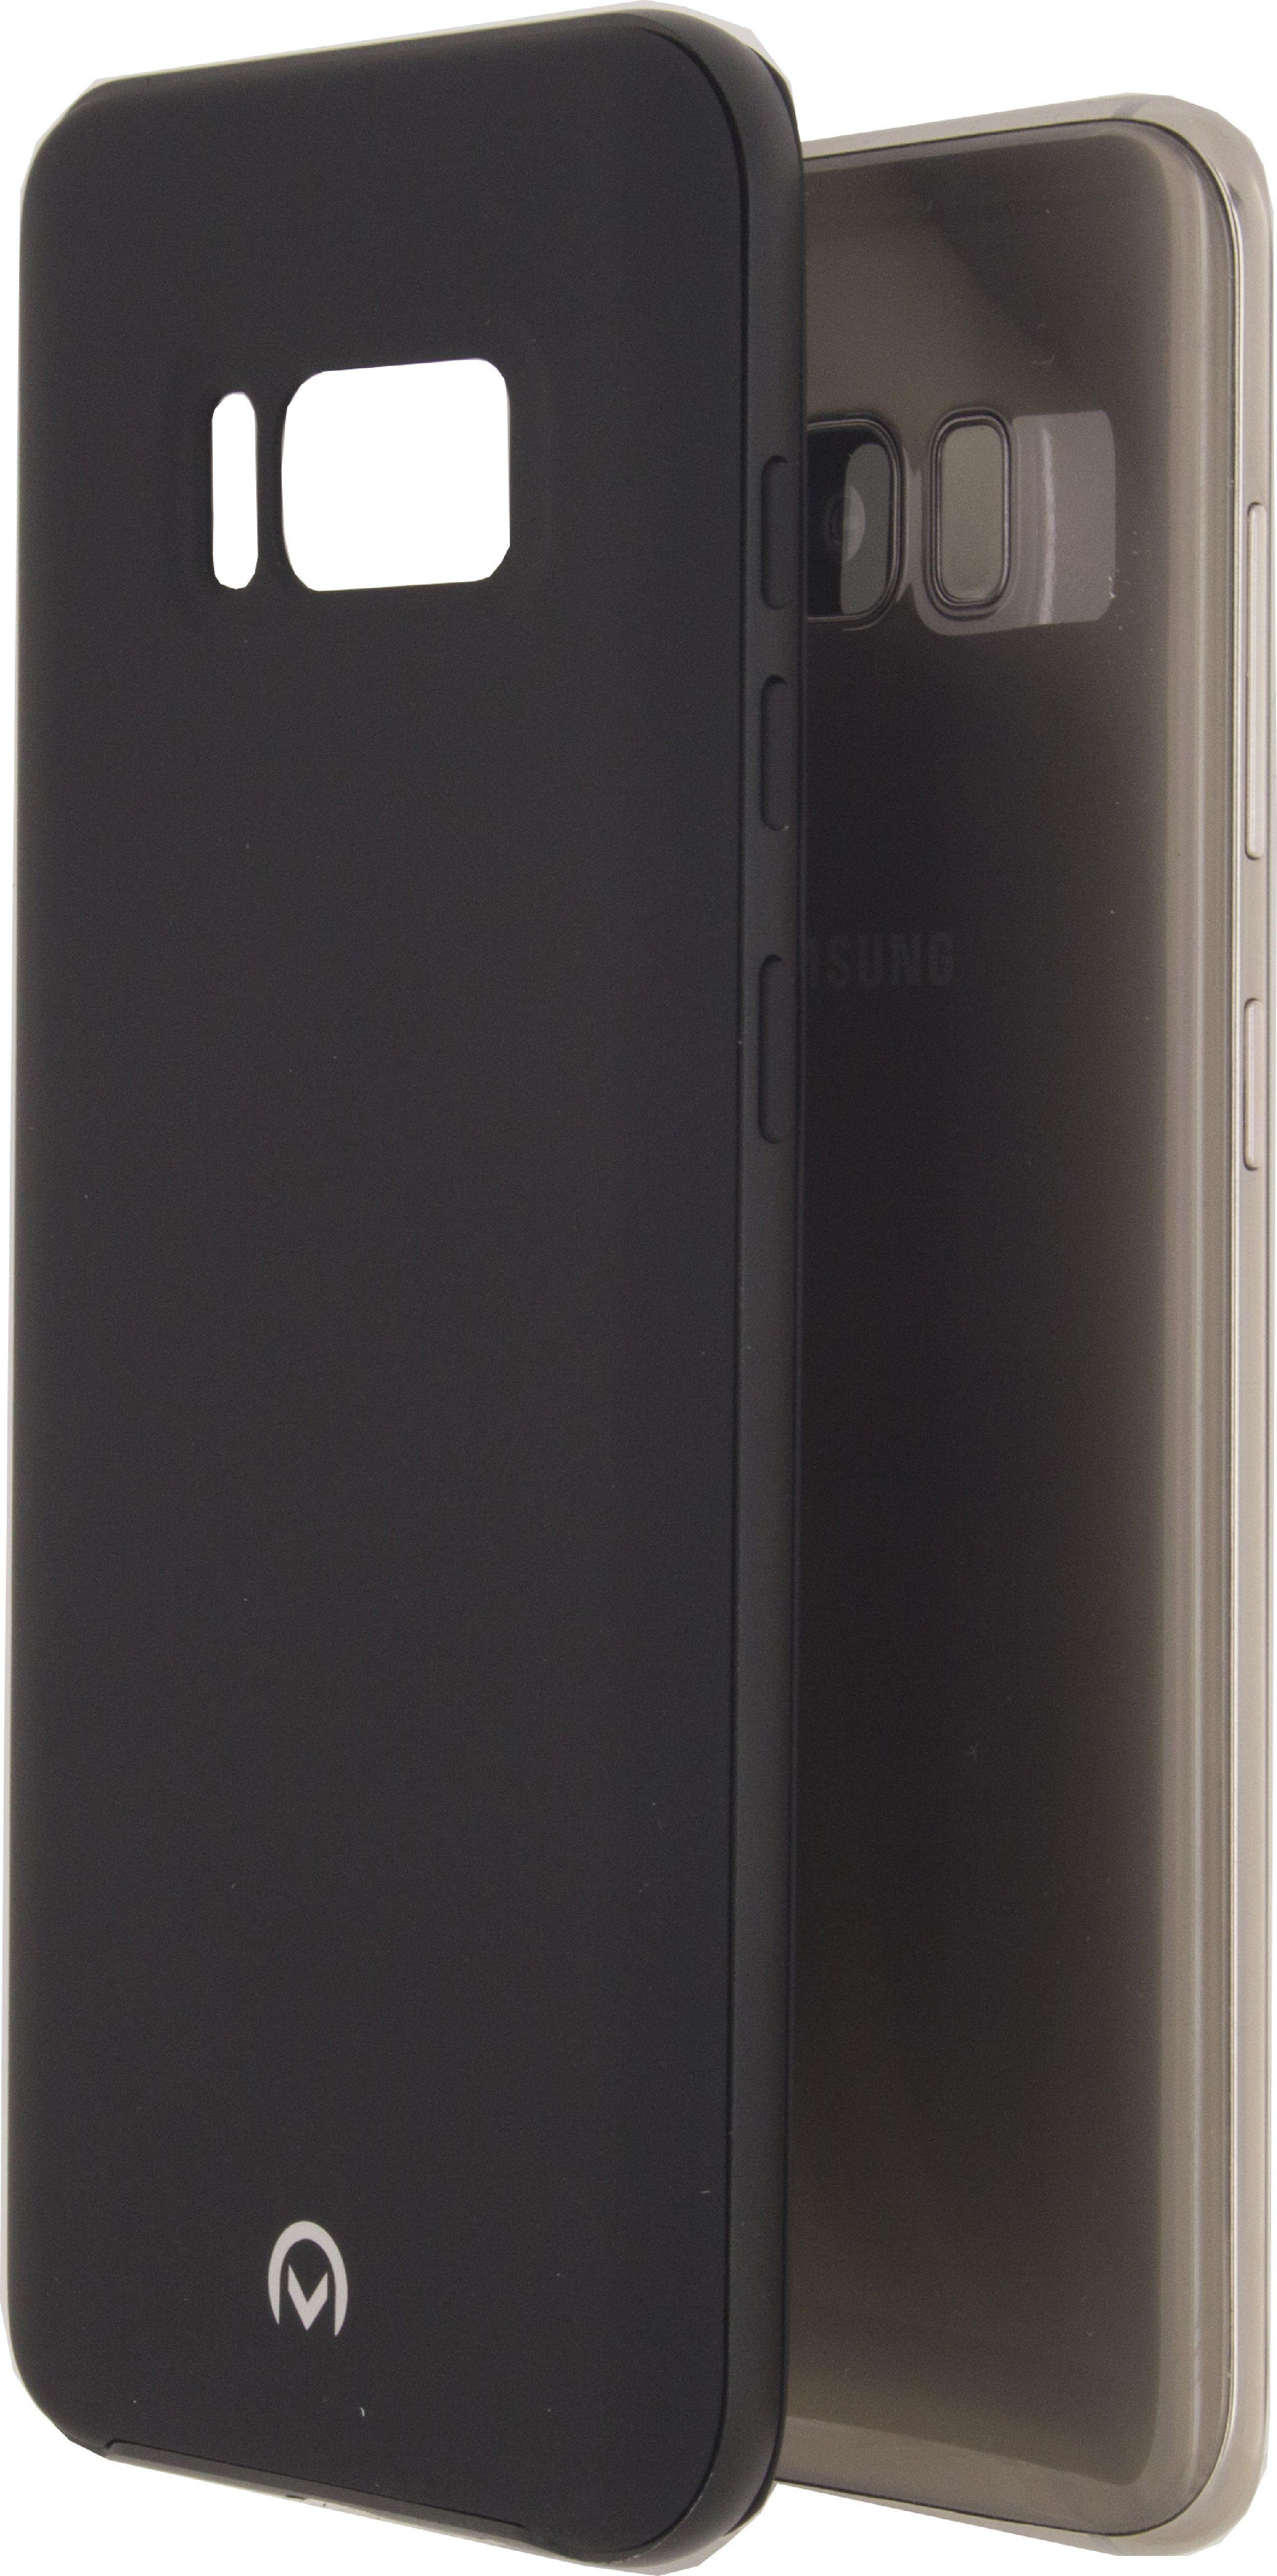 Image of   Telefon Gelly+ Etui Samsung Galaxy S8 Sort